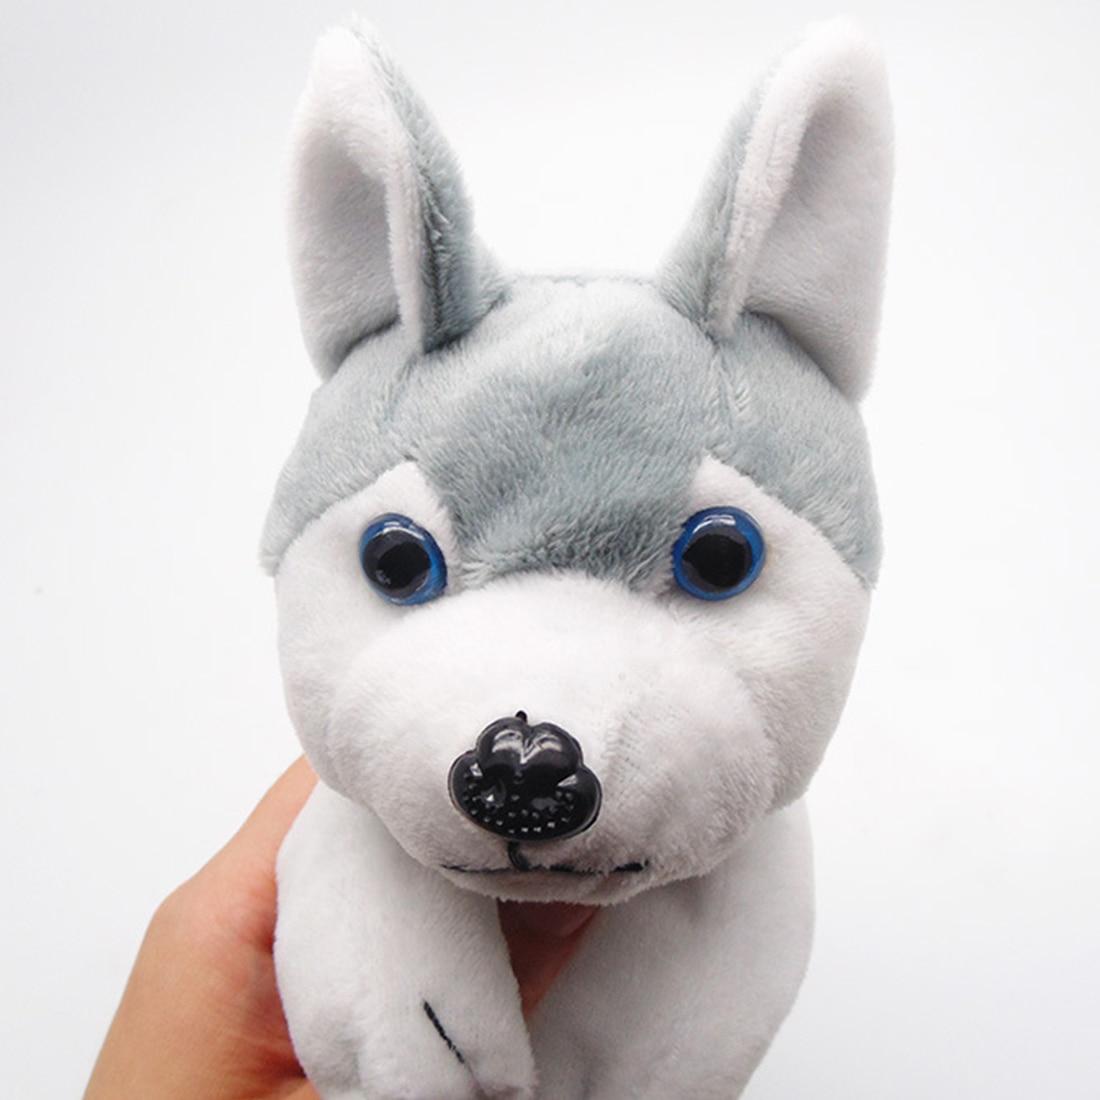 FangNymph Kawaii Cartoon Plush Toy Dog Pencil Case Cute Animal Pen Bag Box Stuffed Animal Doll Gift School Supplies Stationery